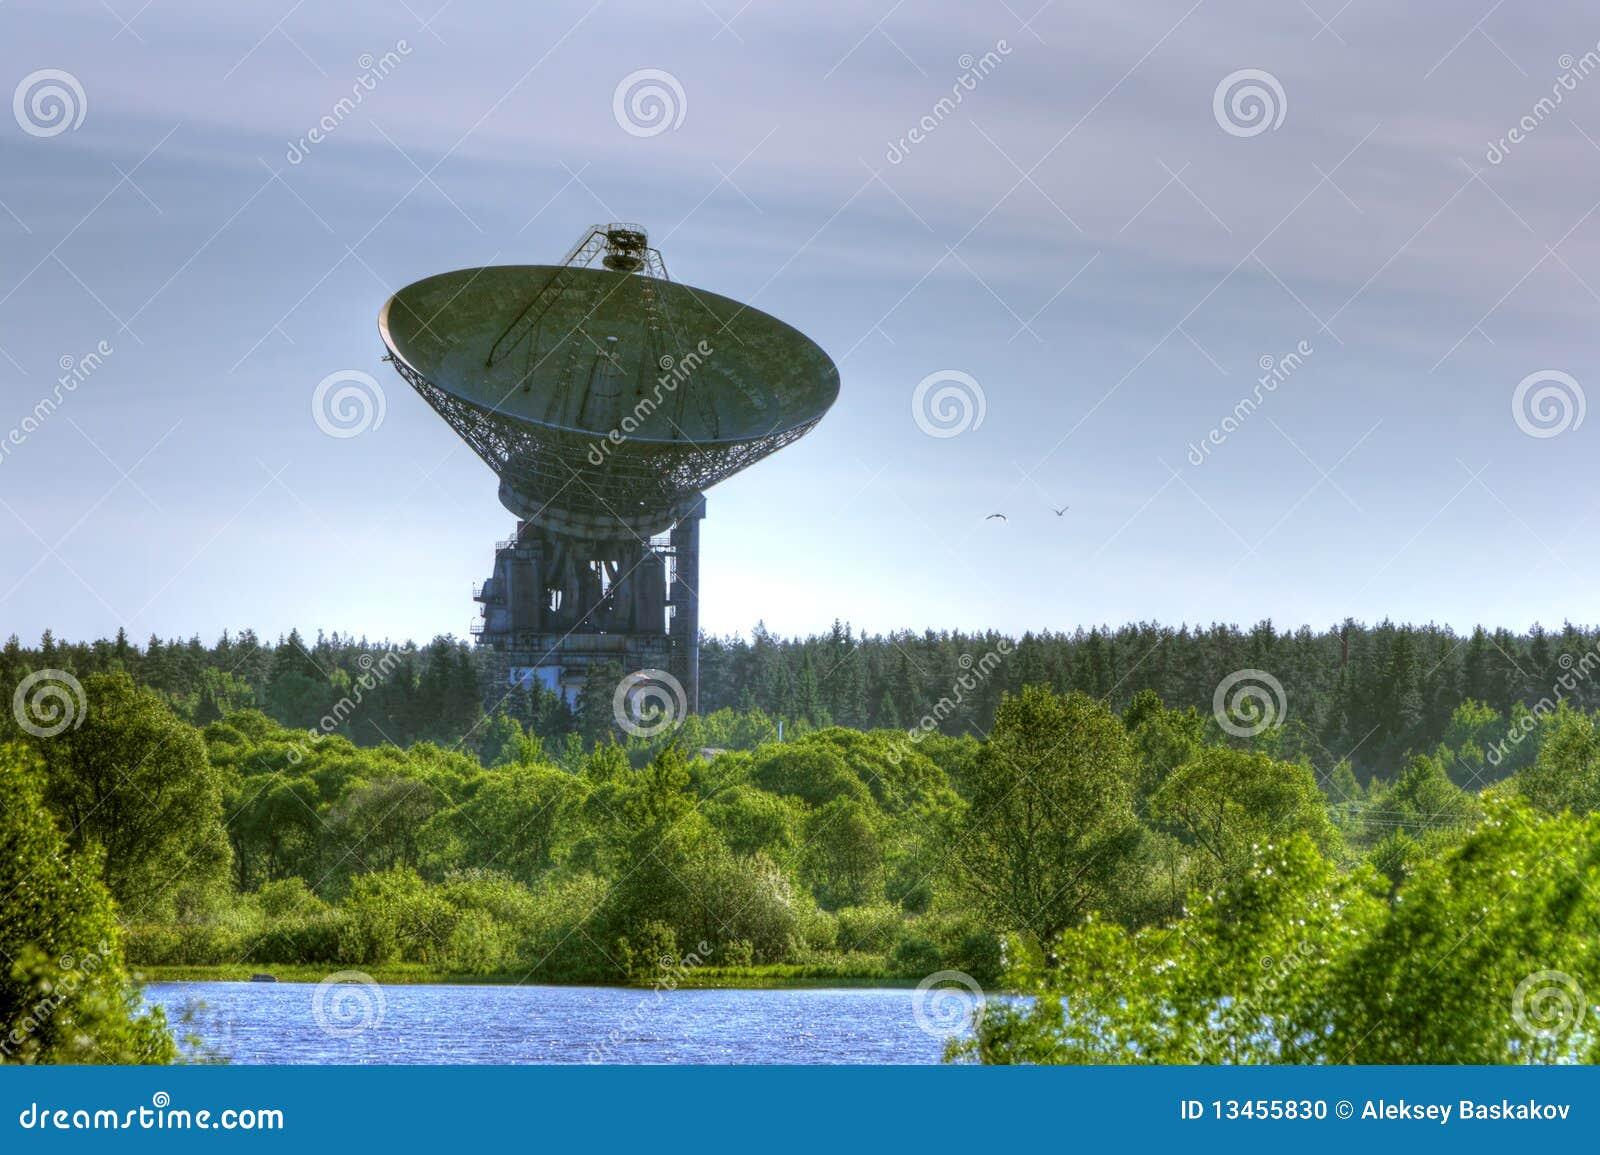 Space Communication Antenna Stock Photo Image 13455830